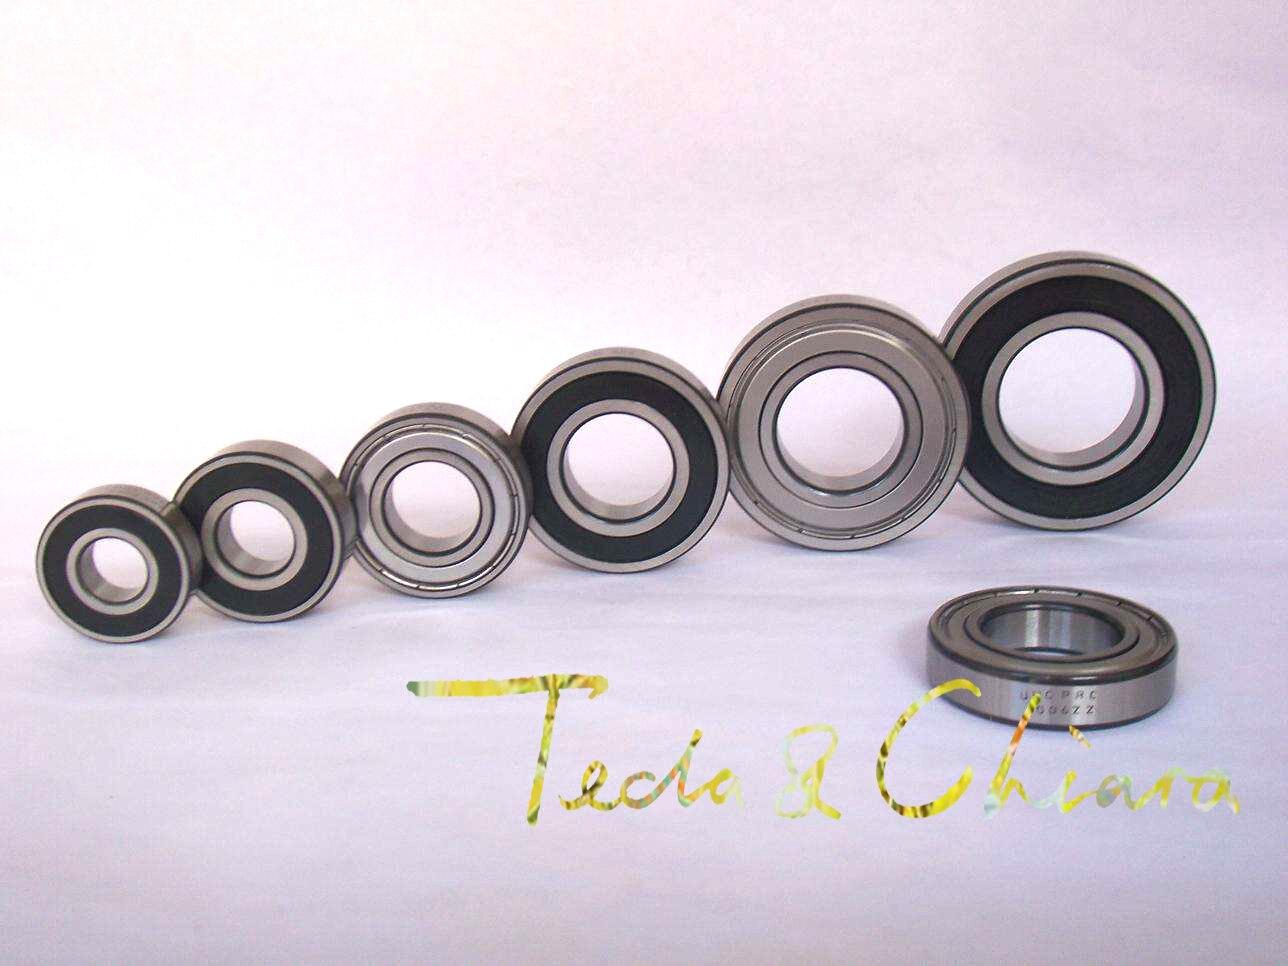 673-2Z 673ZZ MR63 MR63ZZ MR63RS MR63-2Z MR63Z MR63-2RS ZZ RS RZ 2RZ Deep Groove Ball Bearings 3 x 6 x 2.5mm High Quality 6000 6000zz 6000rs 6000 2z 6000z 6000 2rs zz rs rz 2rz deep groove ball bearings 10 x 26 x 8mm high quality